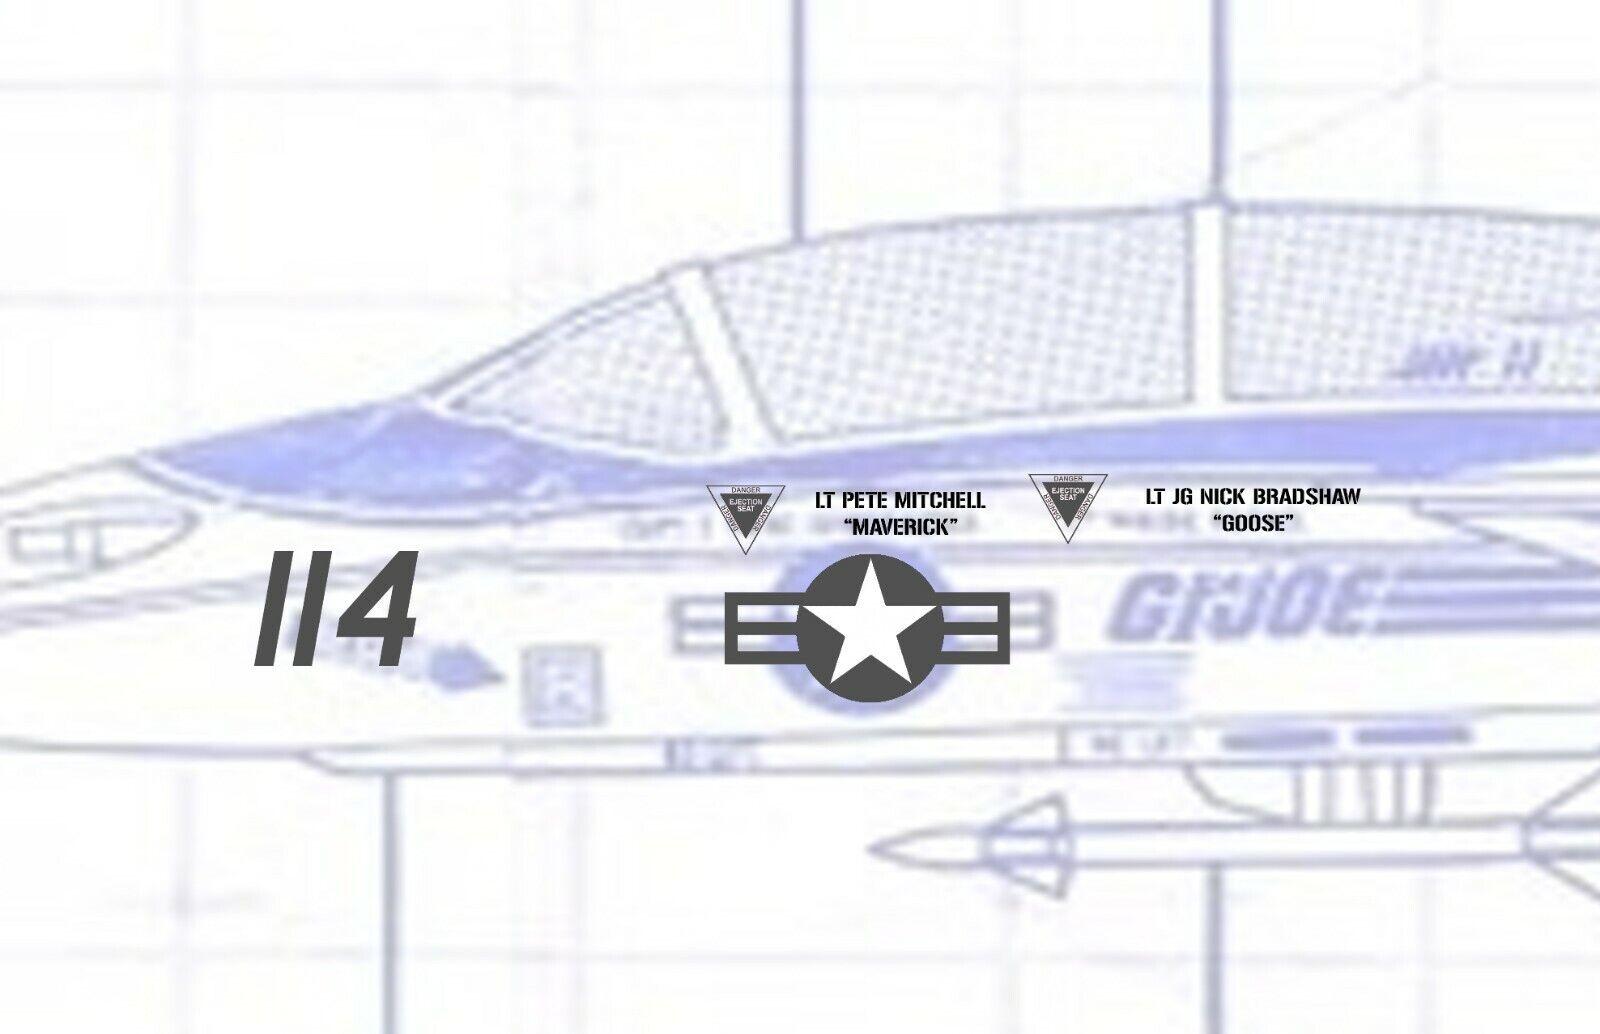 1//18 Scale GI Joe Skystriker Topgun Maverick F-14 Tomcat Waterslide Decals